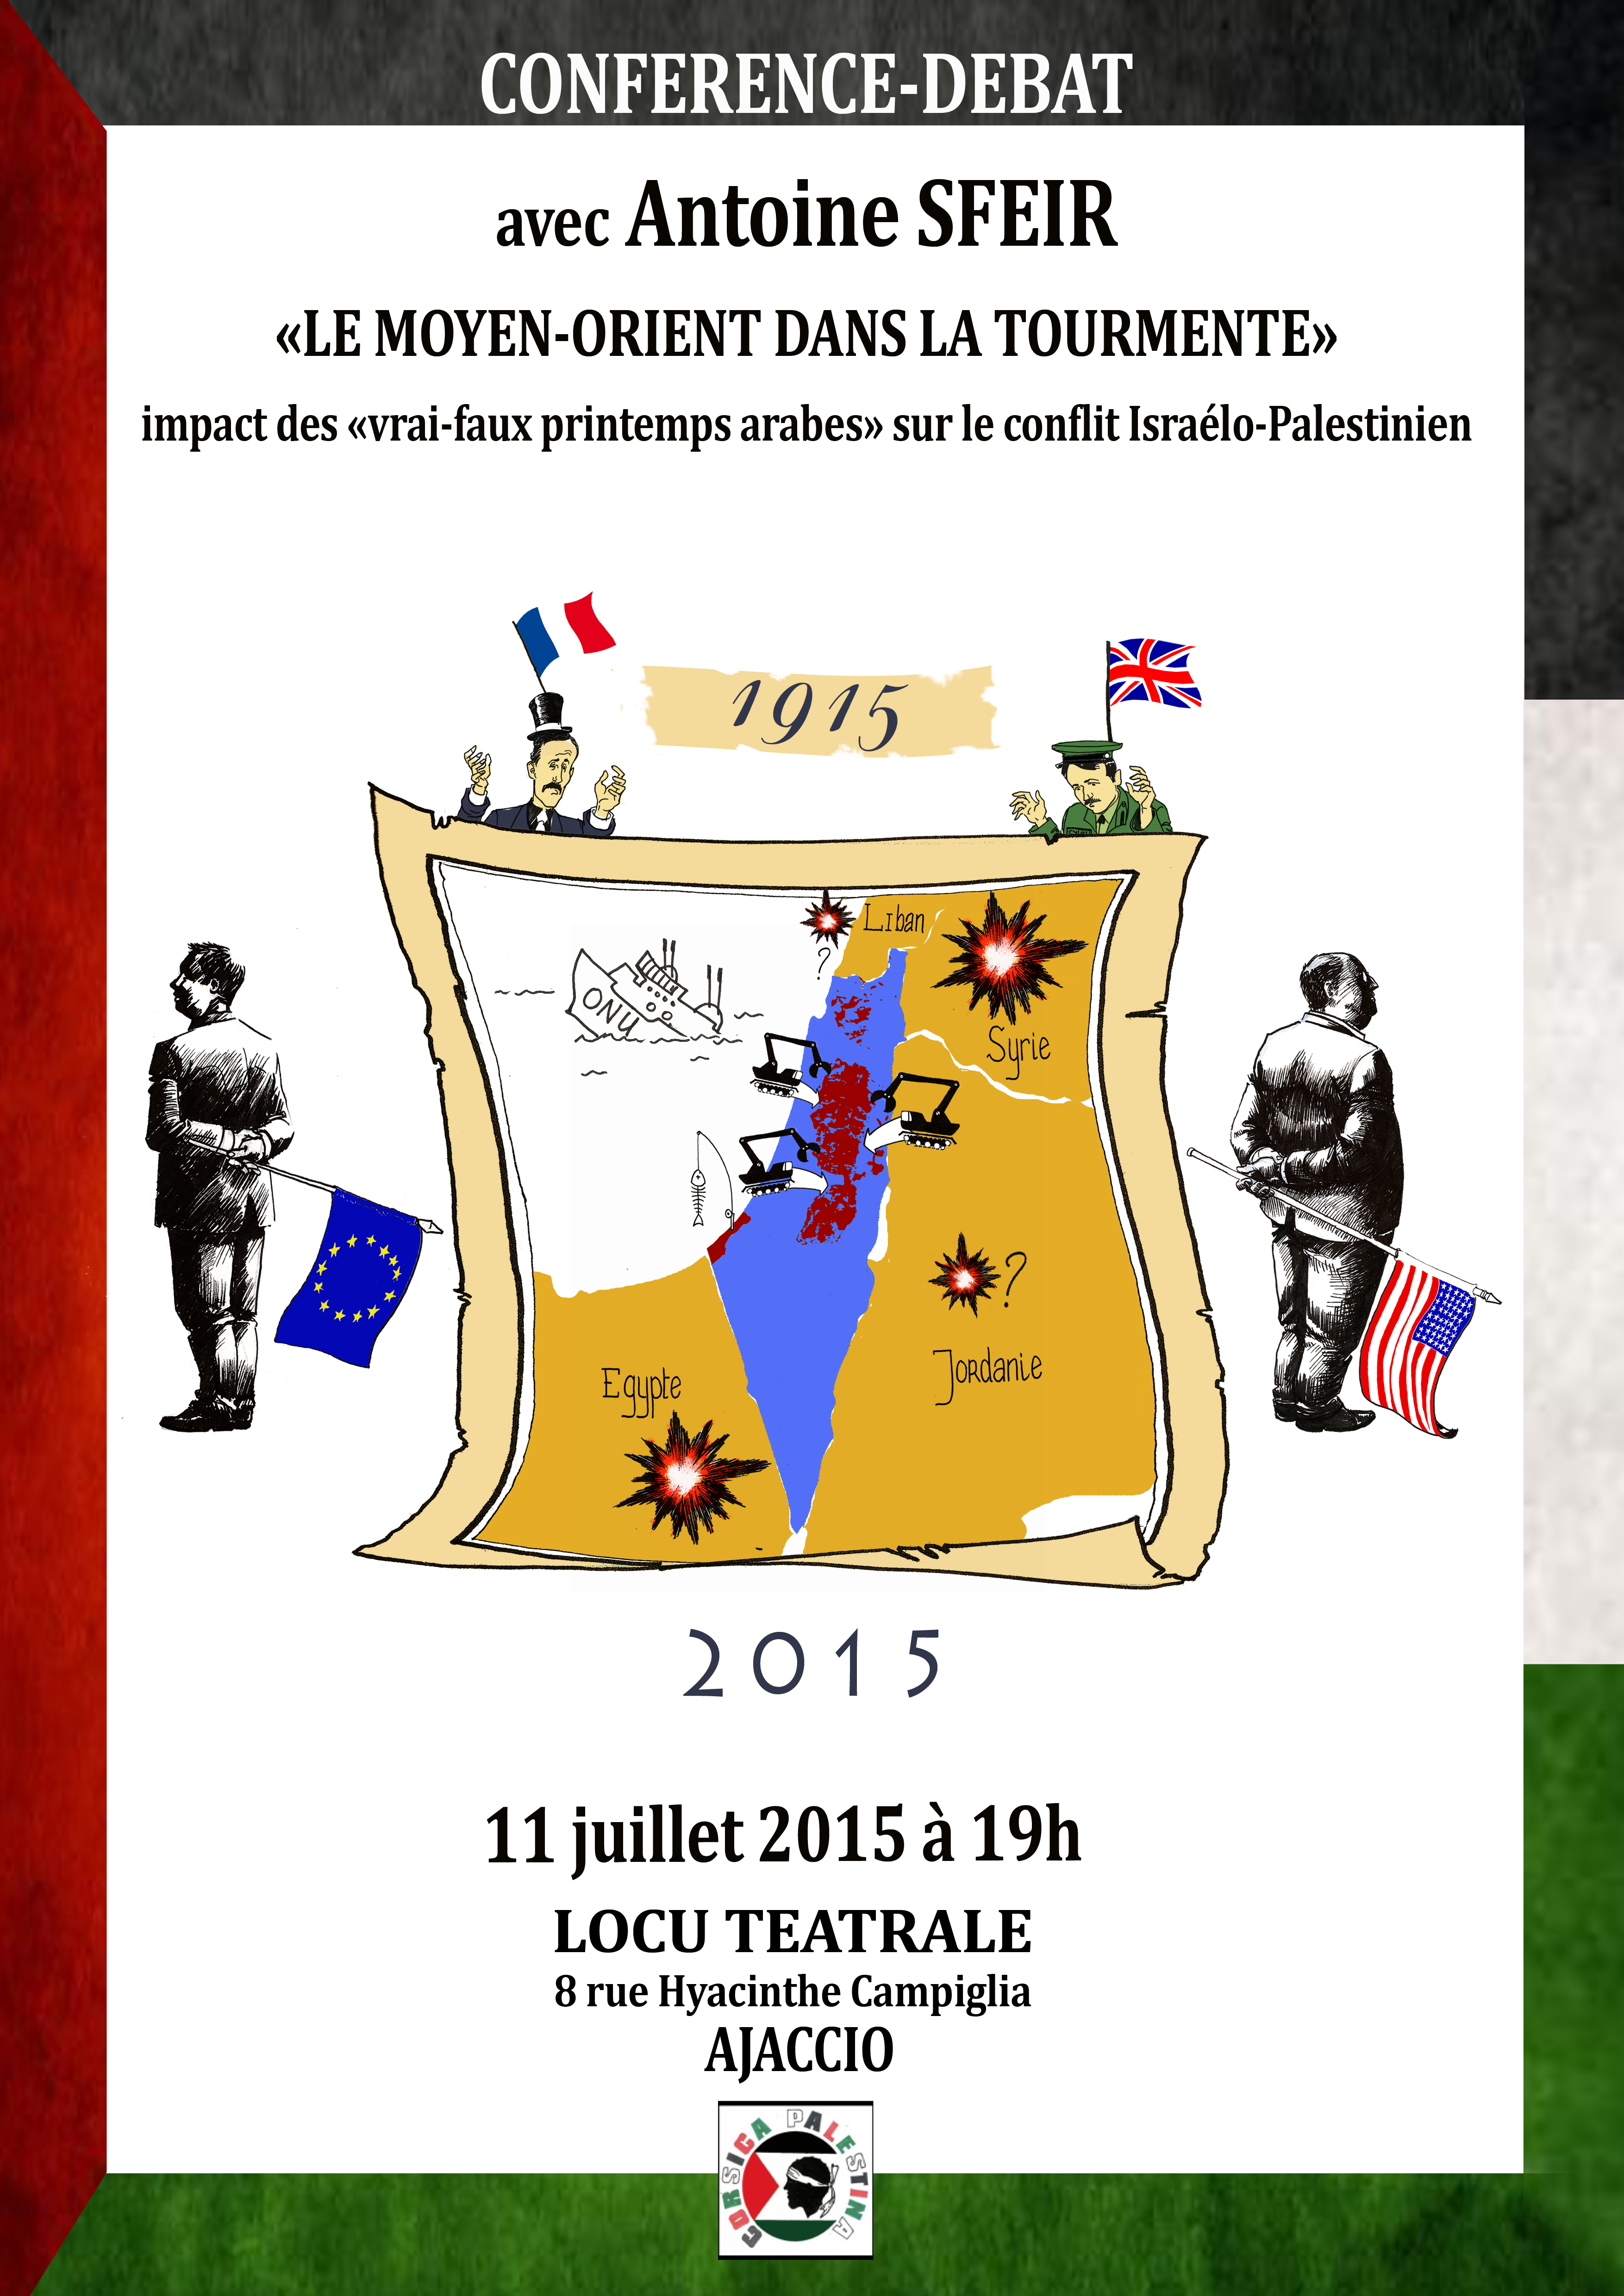 Conférence-débat avec Antoine Sfeir le samedi 11 juillet à Locu Teatrale